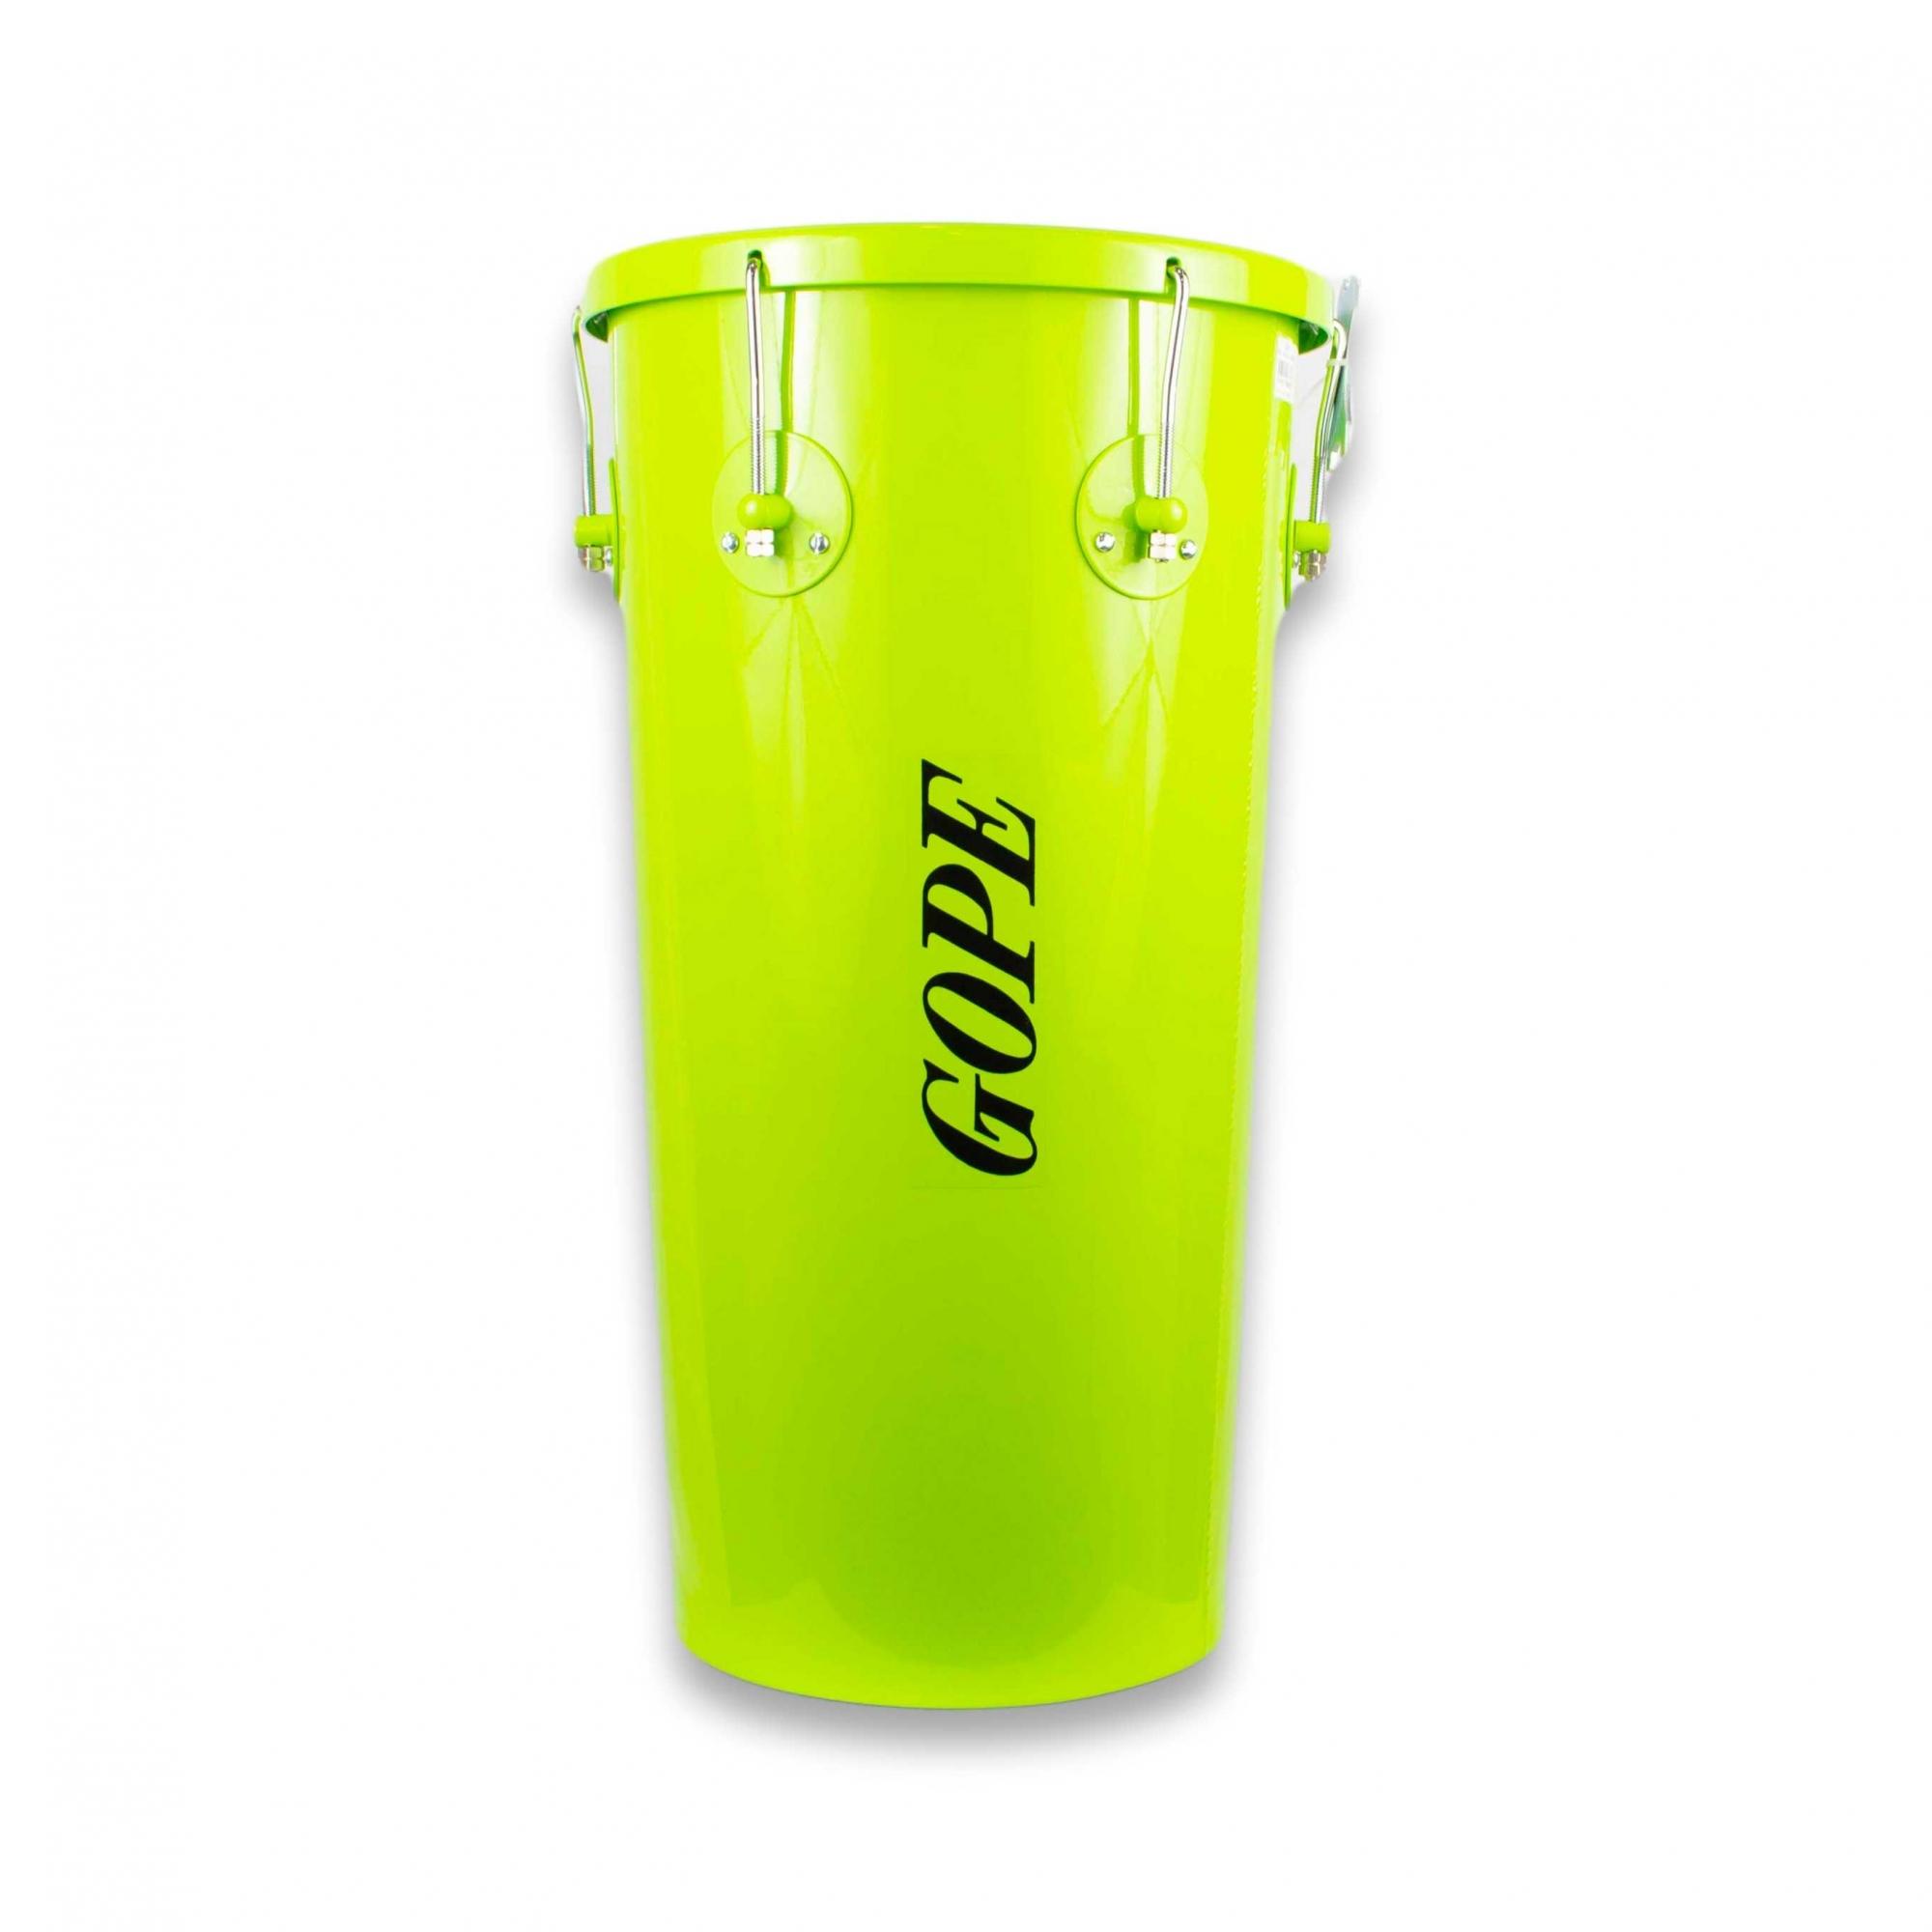 Rebolo Tantan Gope 11 pol 55 cm Verde Limao